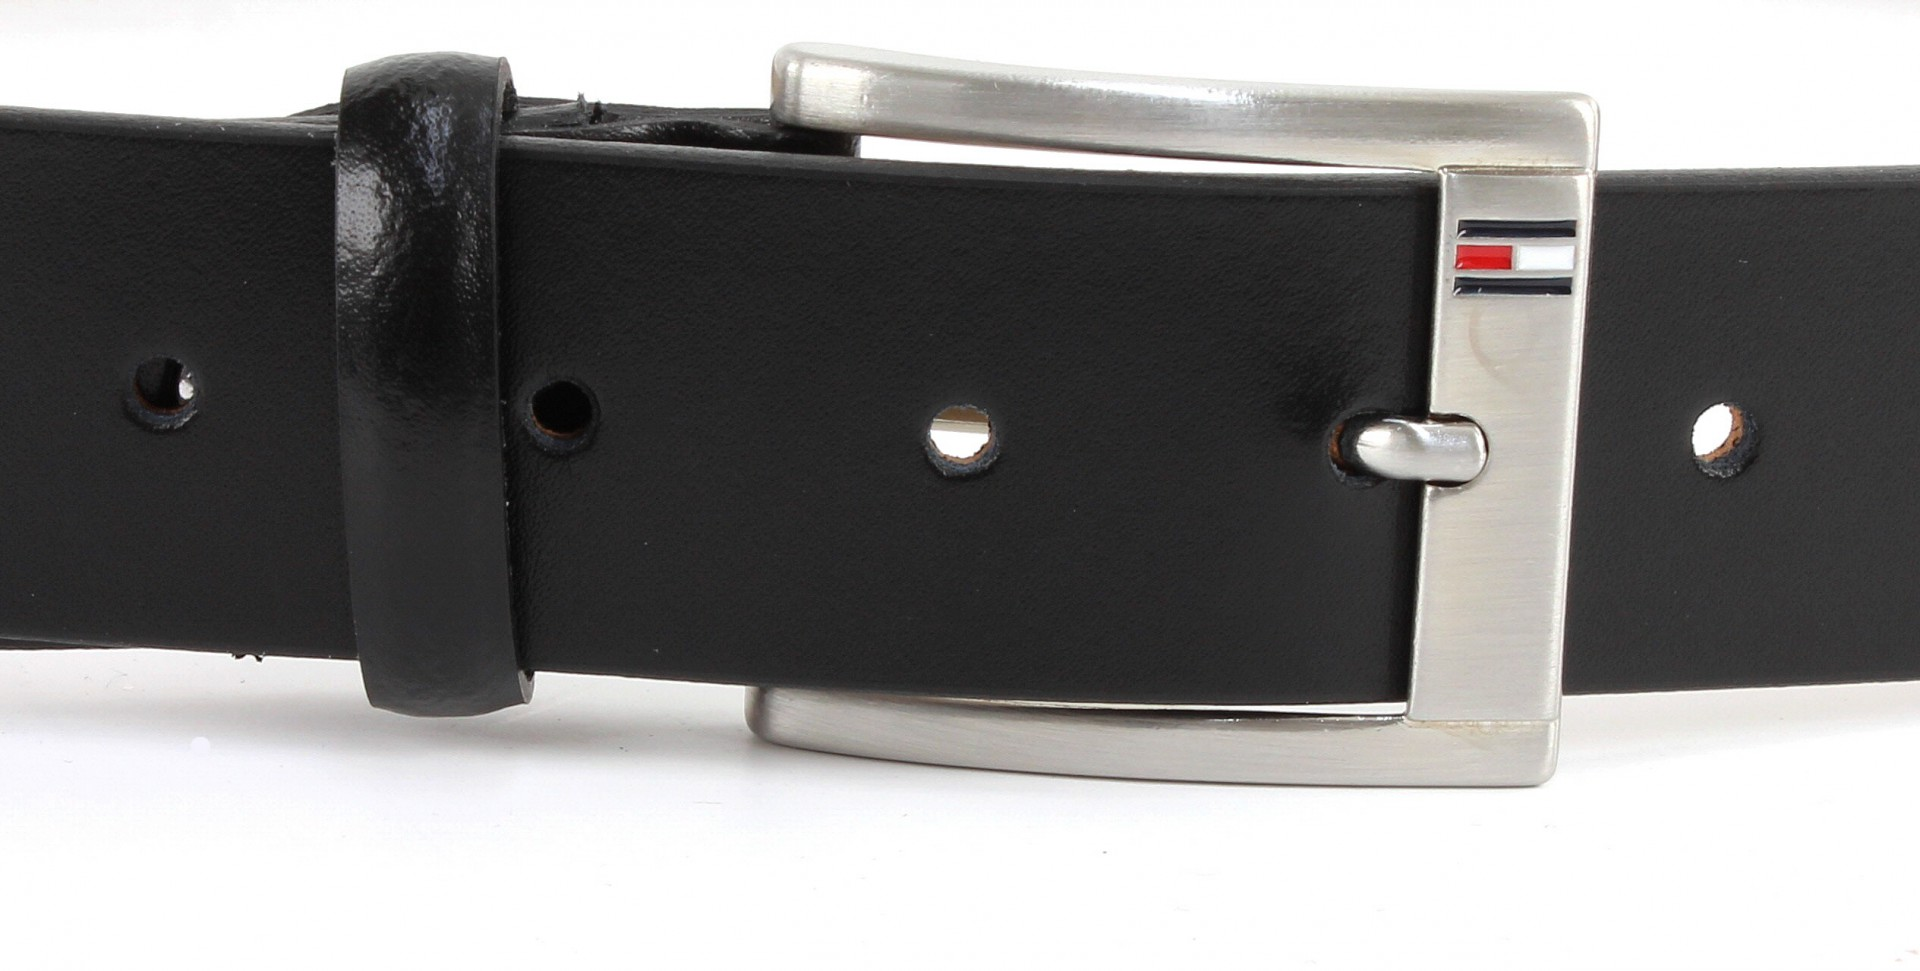 cintura da uomo tommy hilfiger trenton w105 in pelle nera ebay. Black Bedroom Furniture Sets. Home Design Ideas